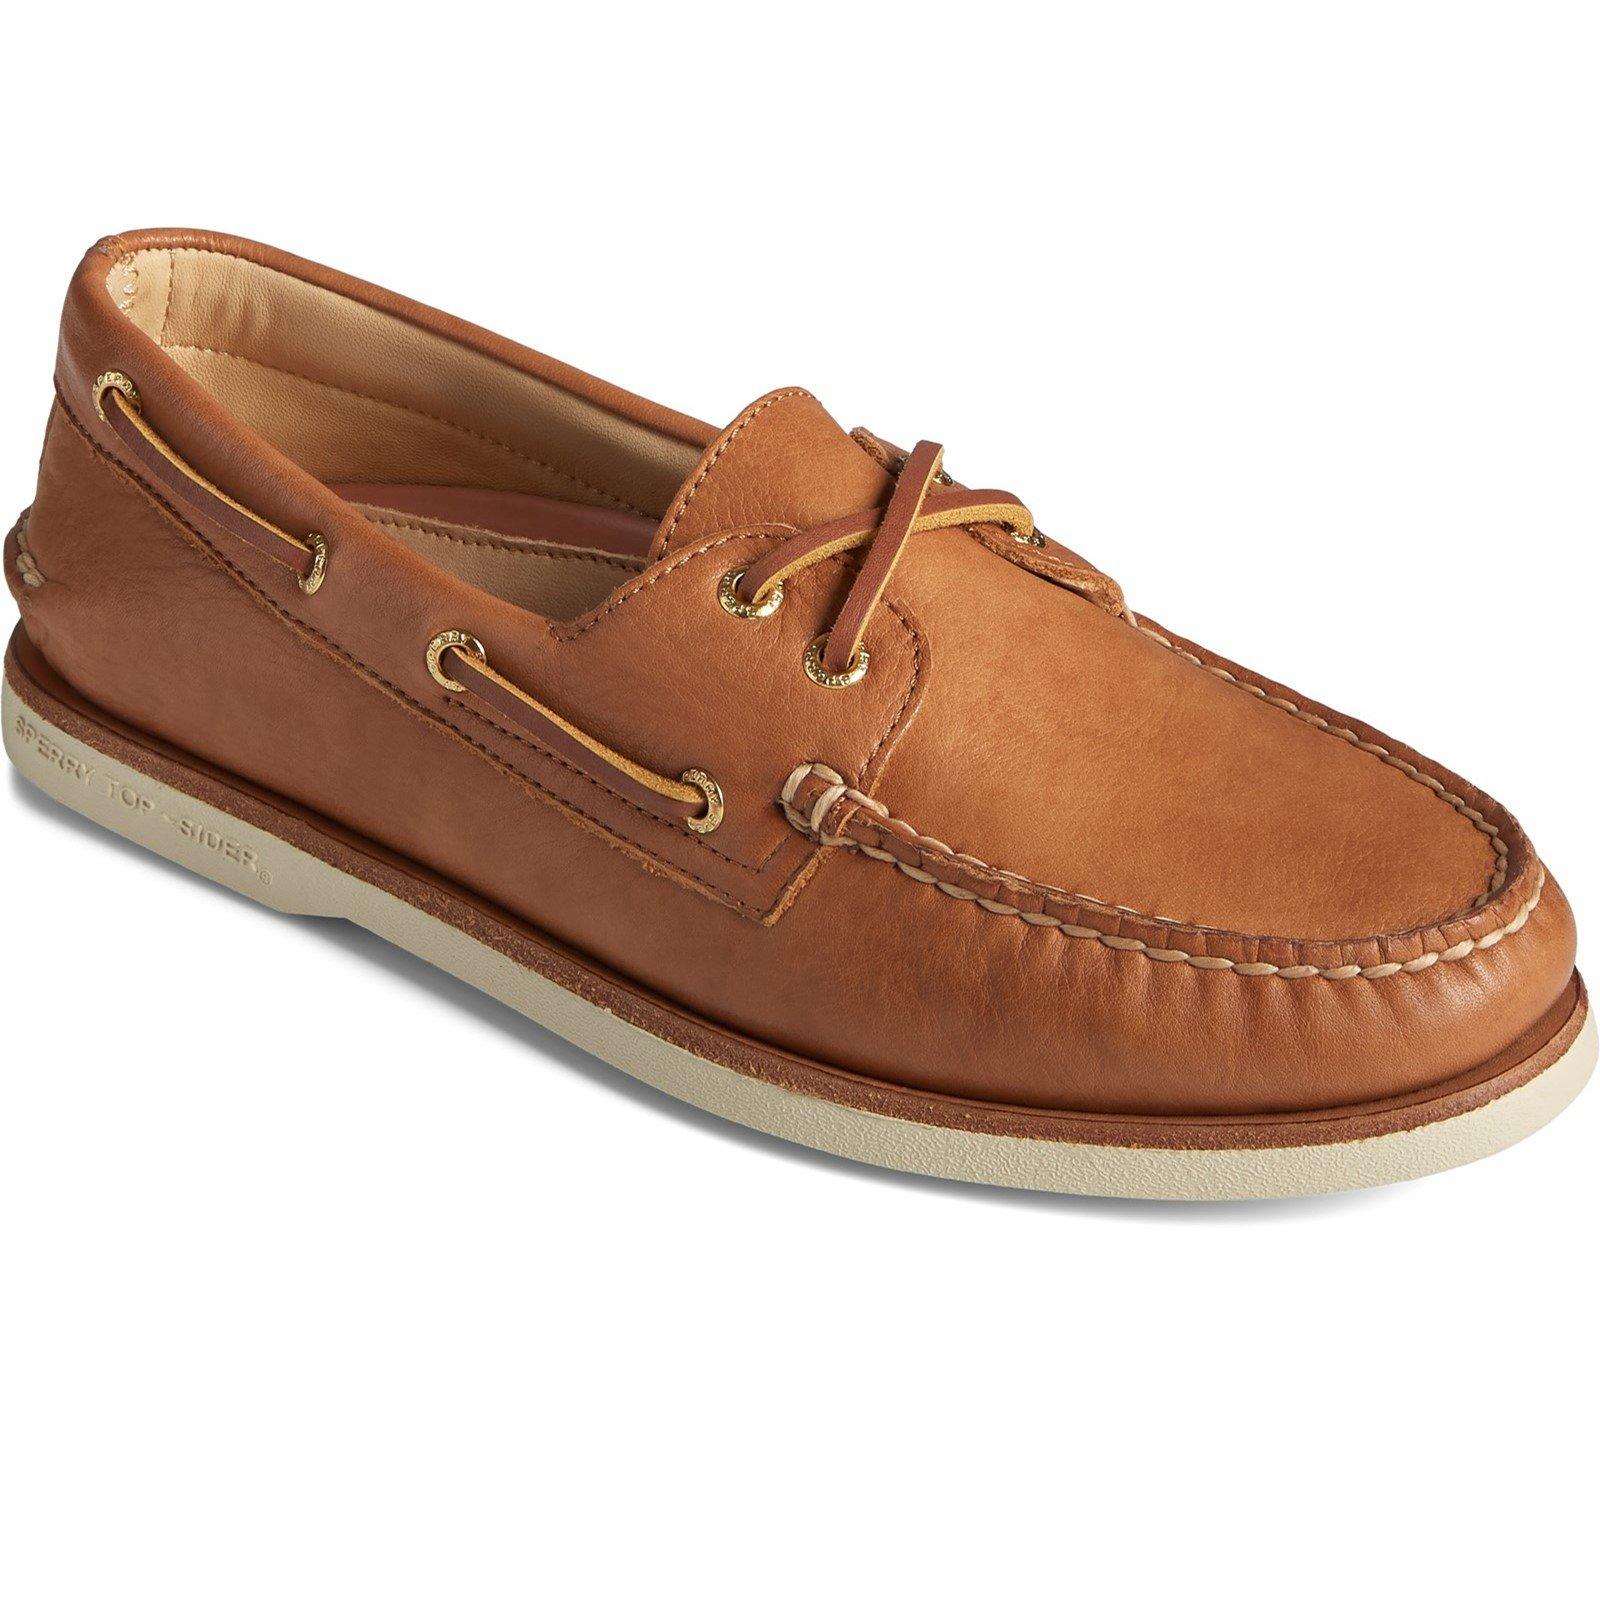 Sperry Men's A/O 2-Eye Boat Shoe Various Colours 32926 - Tan 10.5